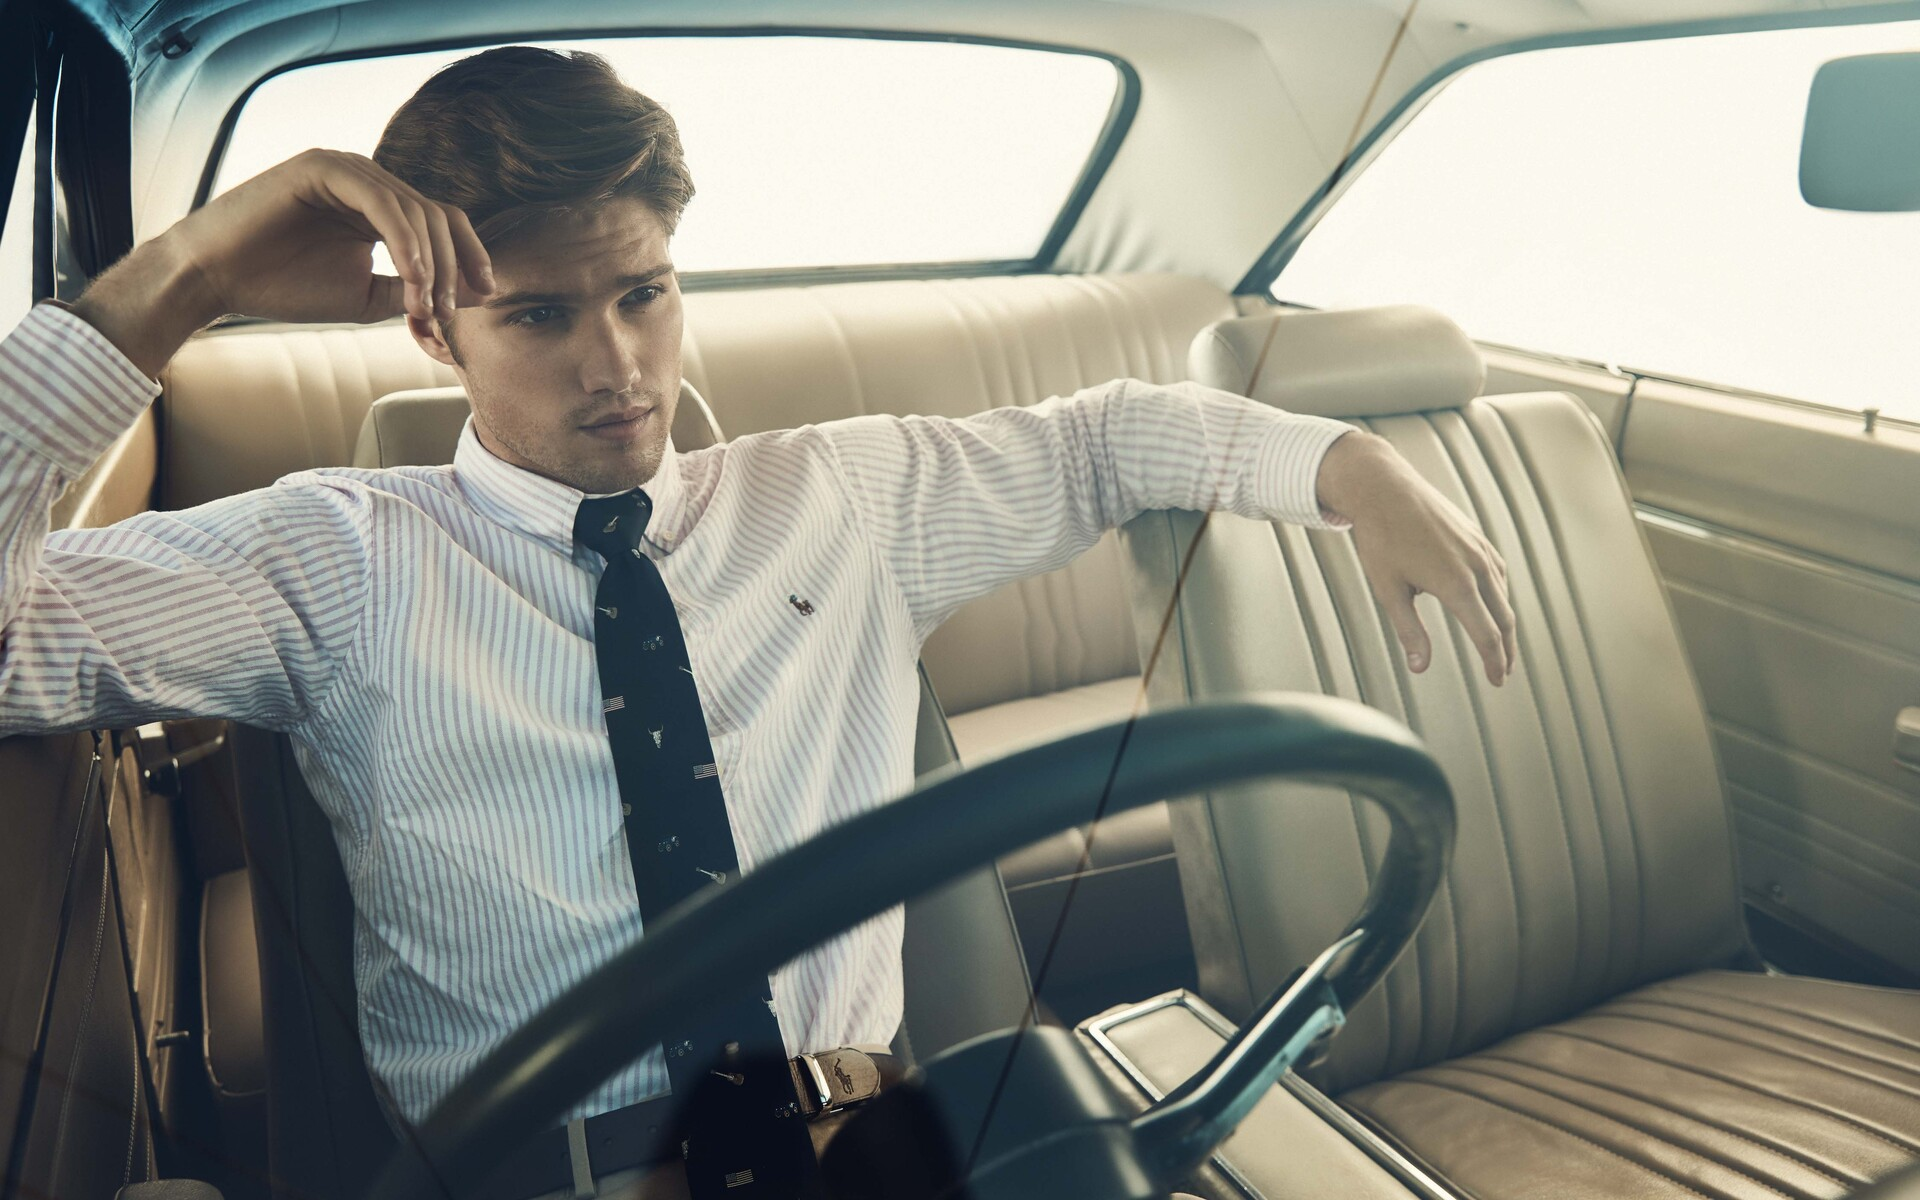 male-model-sitting-in-the-car-ralph-lauren-photoshoot-pz.jpg